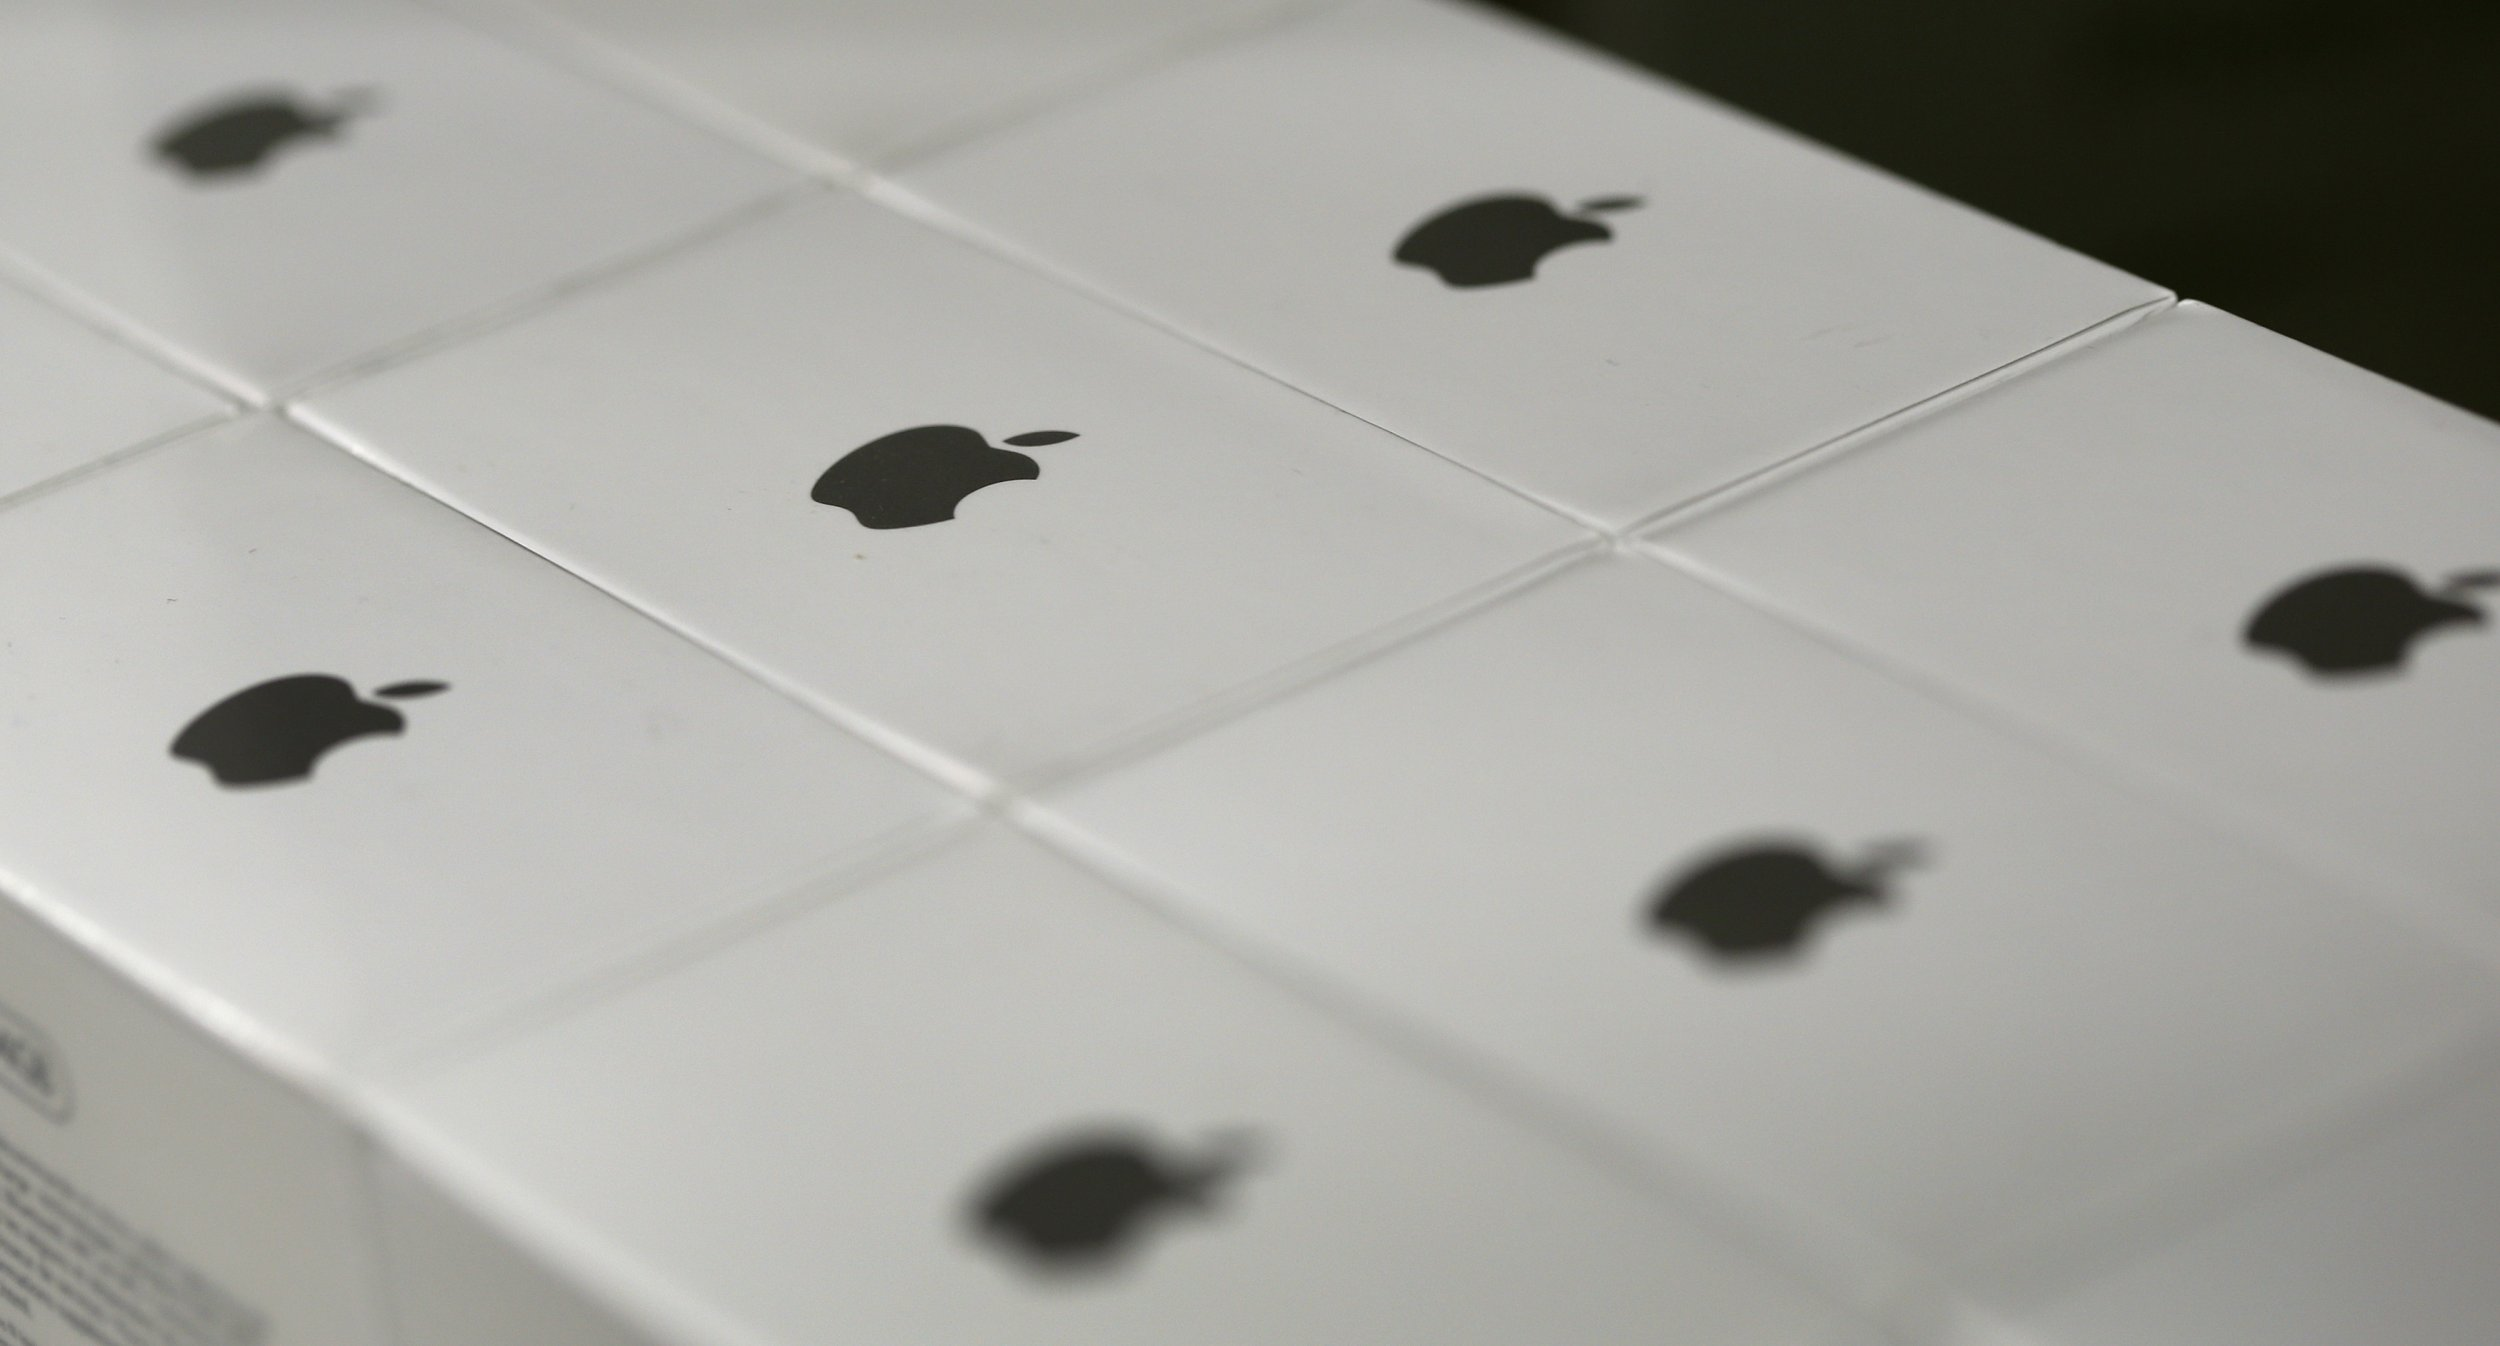 02_18_apple_encryption_01